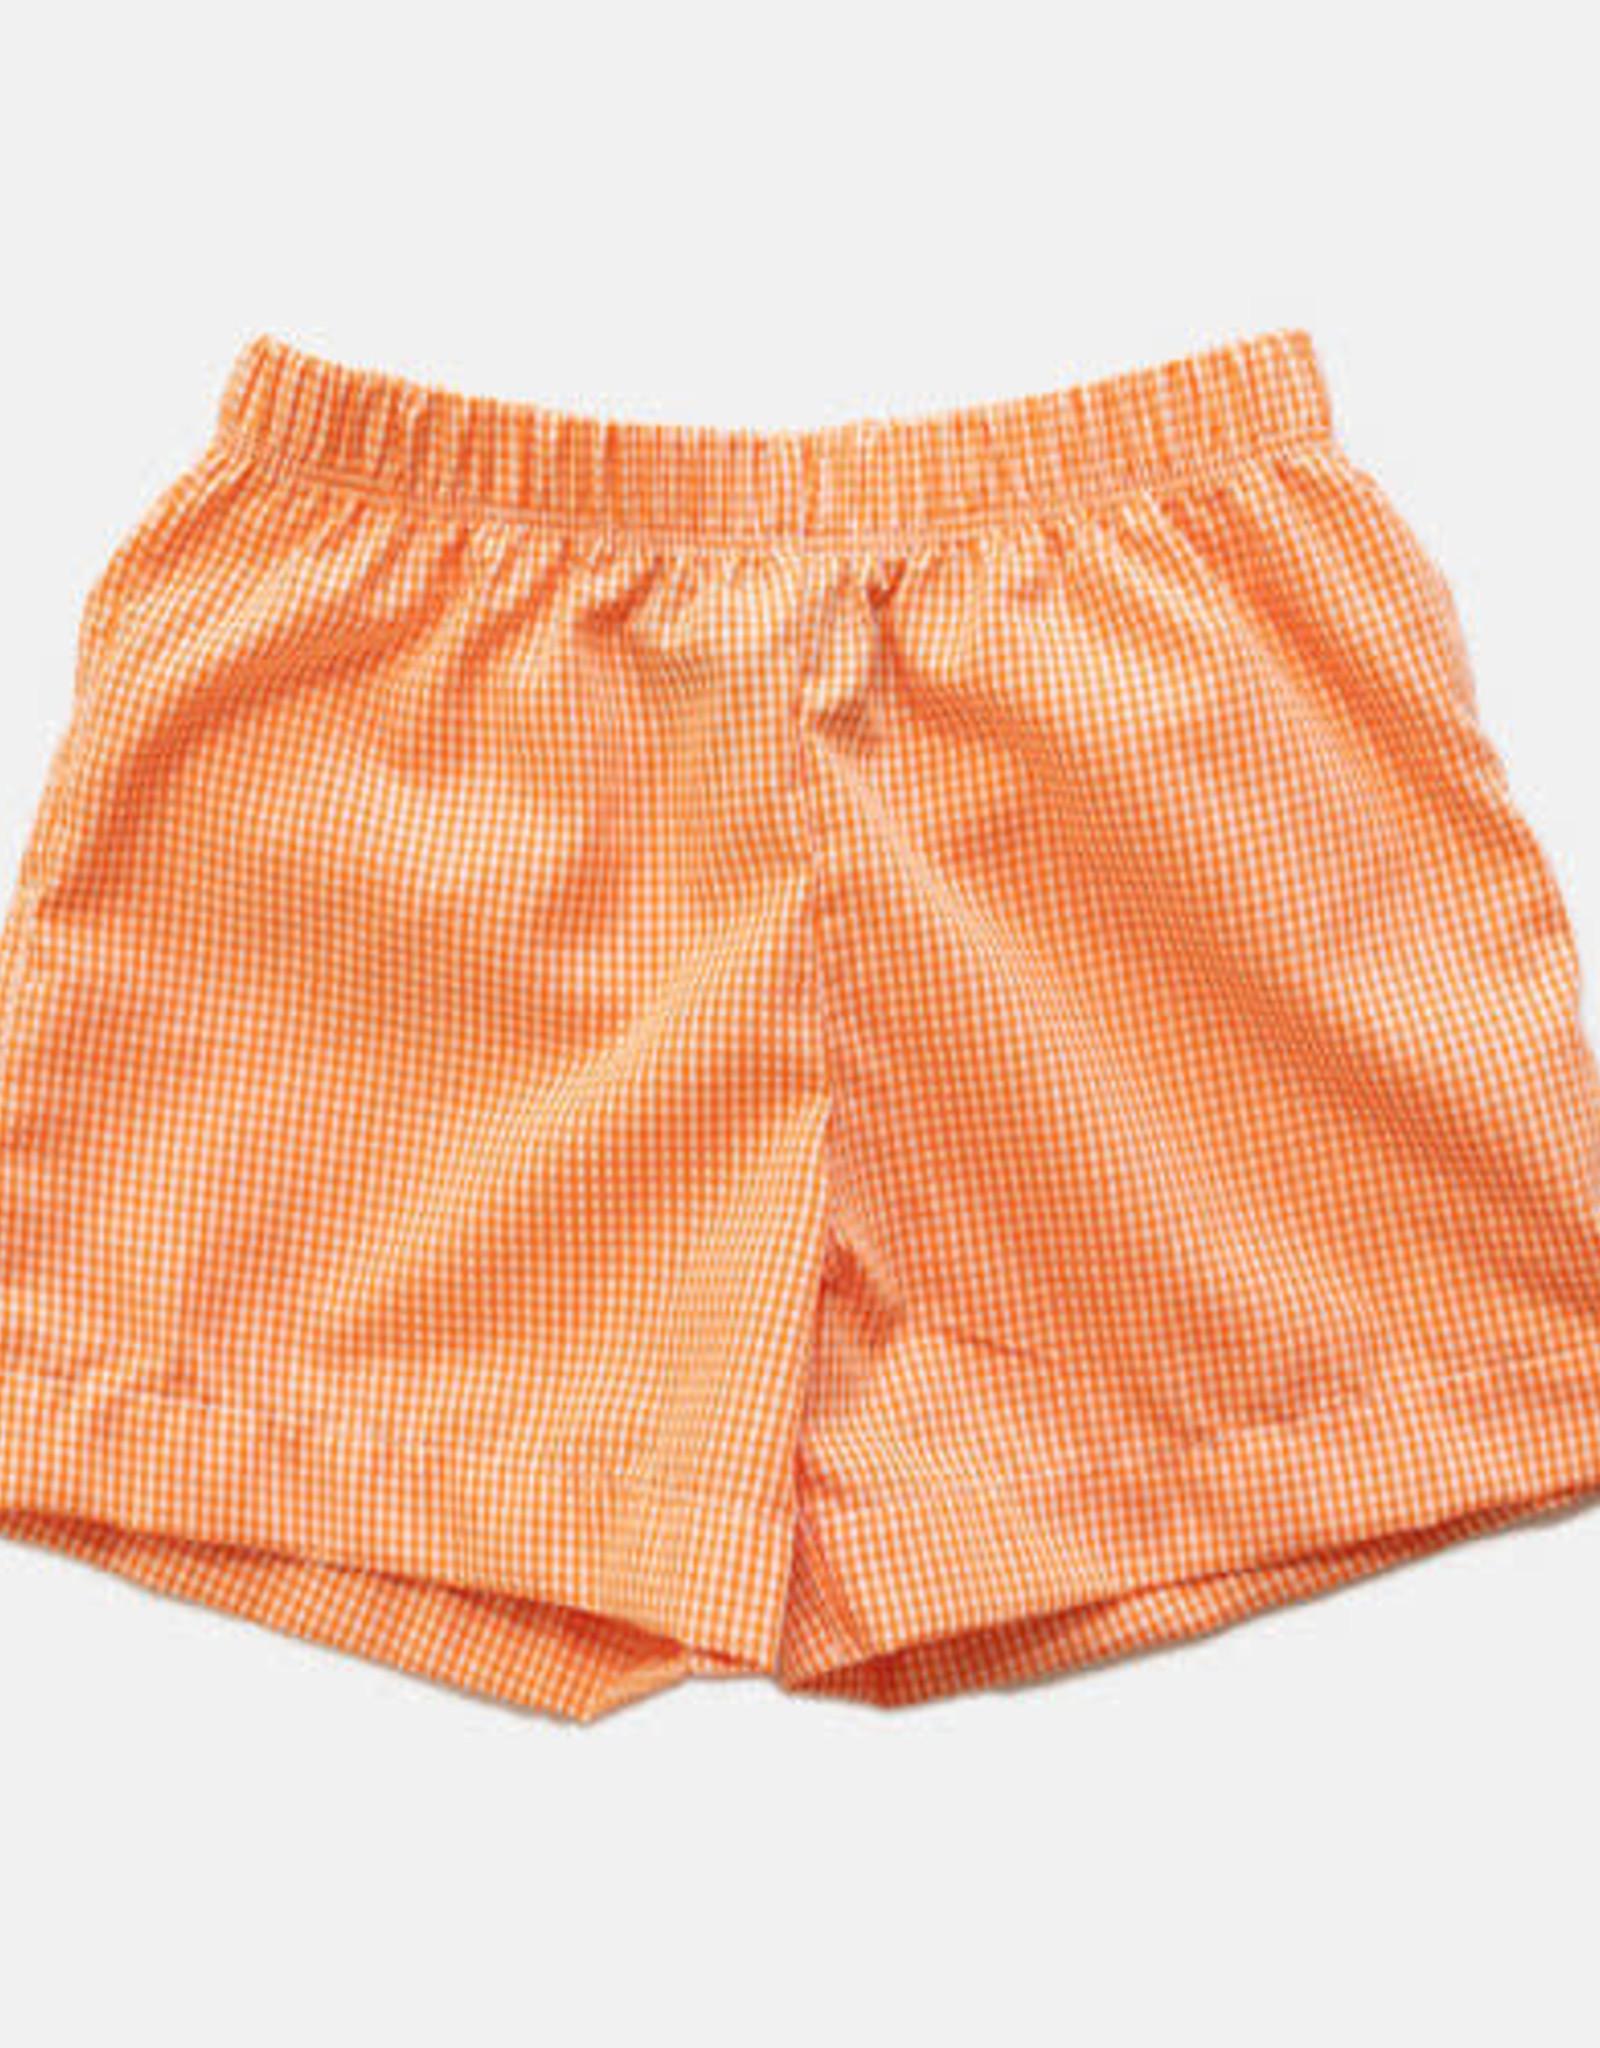 Bon Temps Orange Gingham Shorts